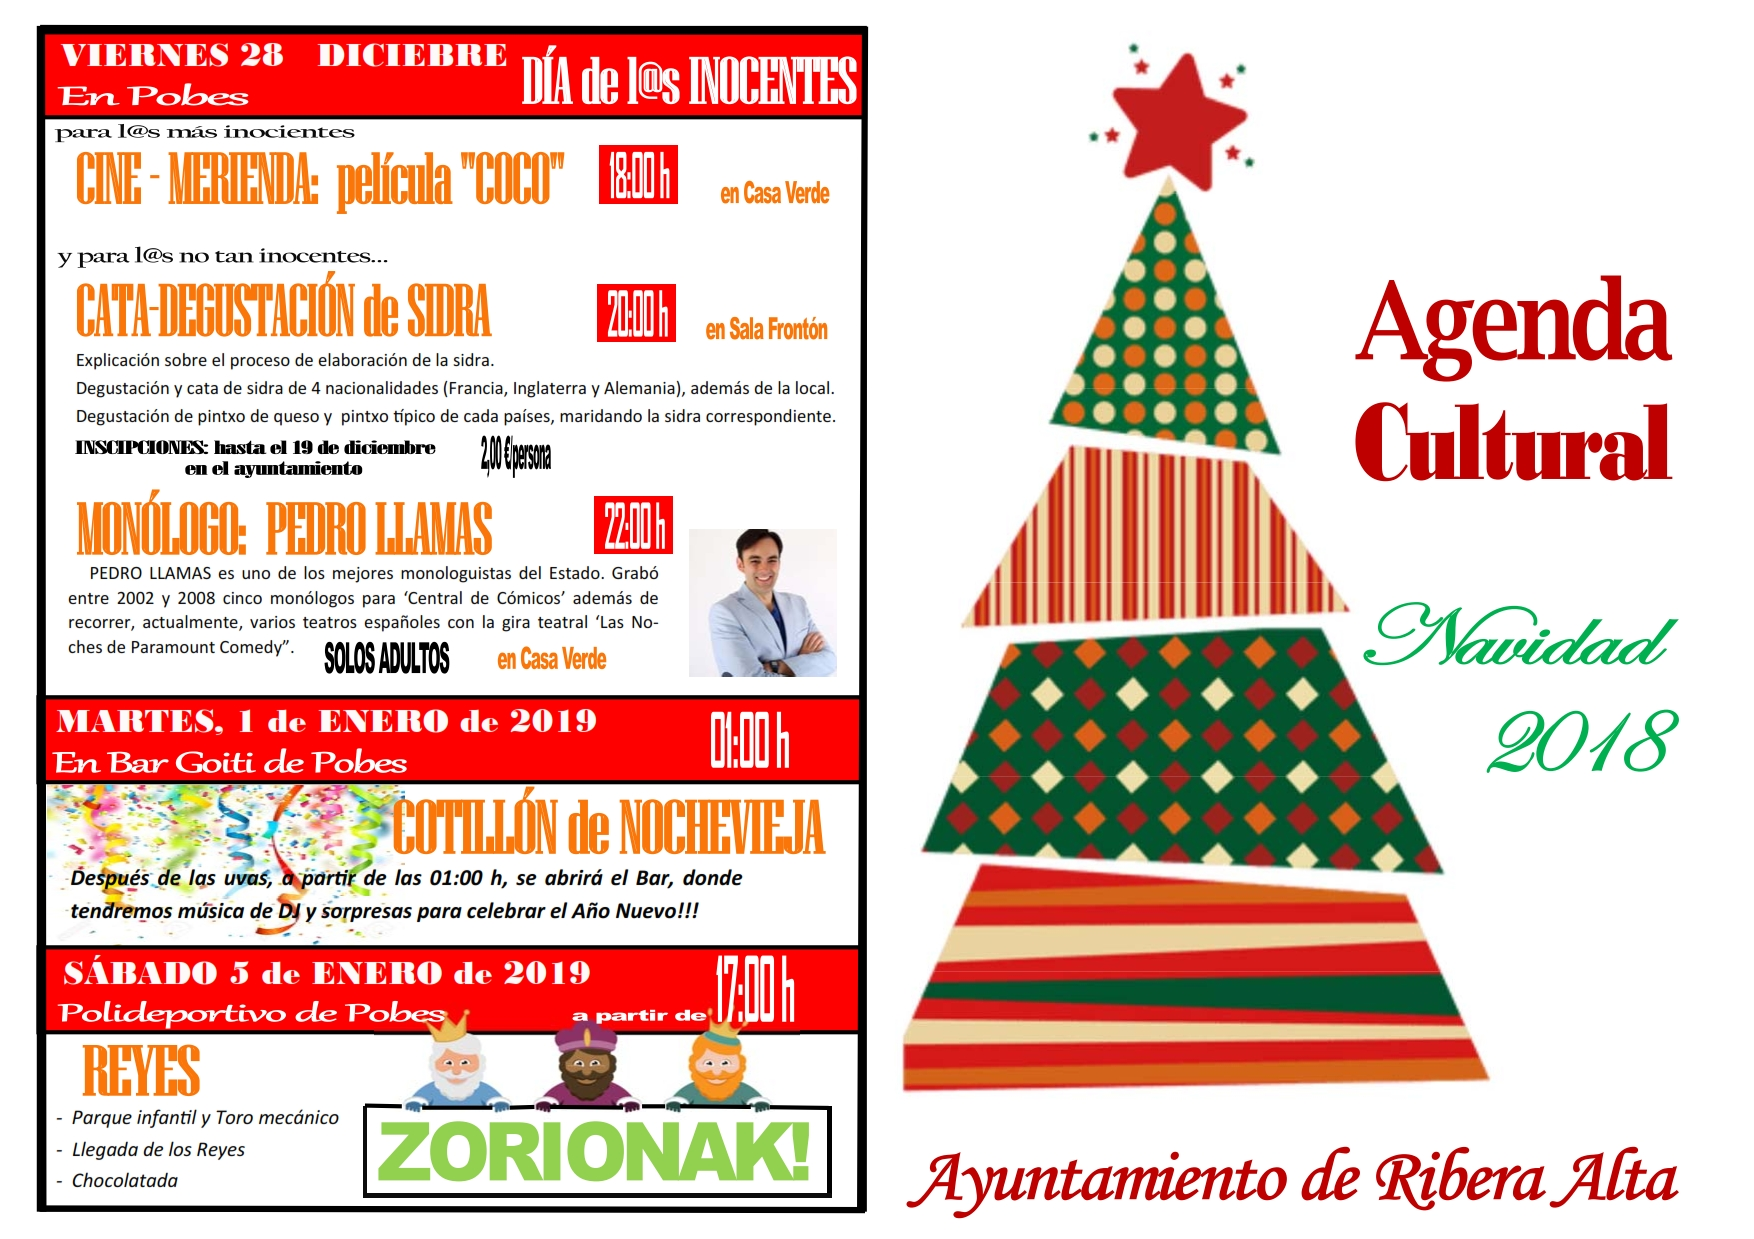 AGENDA CULTURAL, Programa de Navidad 2018 – 2019